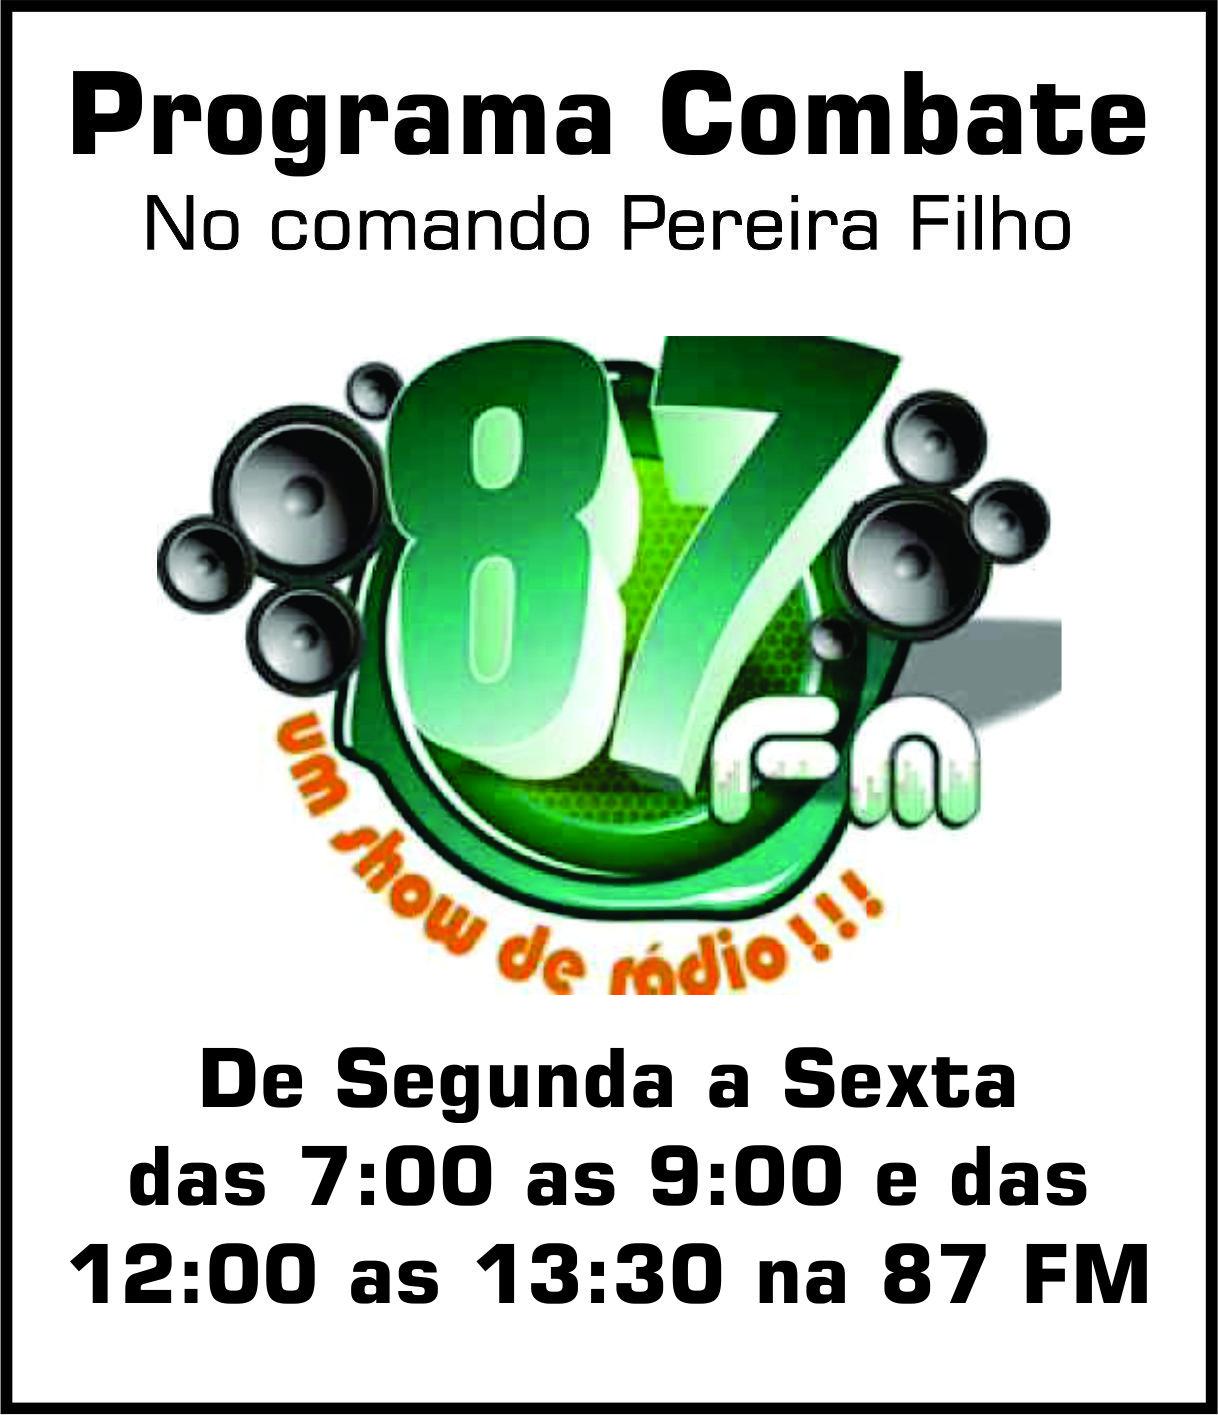 PROGRAMA COMBATE - 87 FM